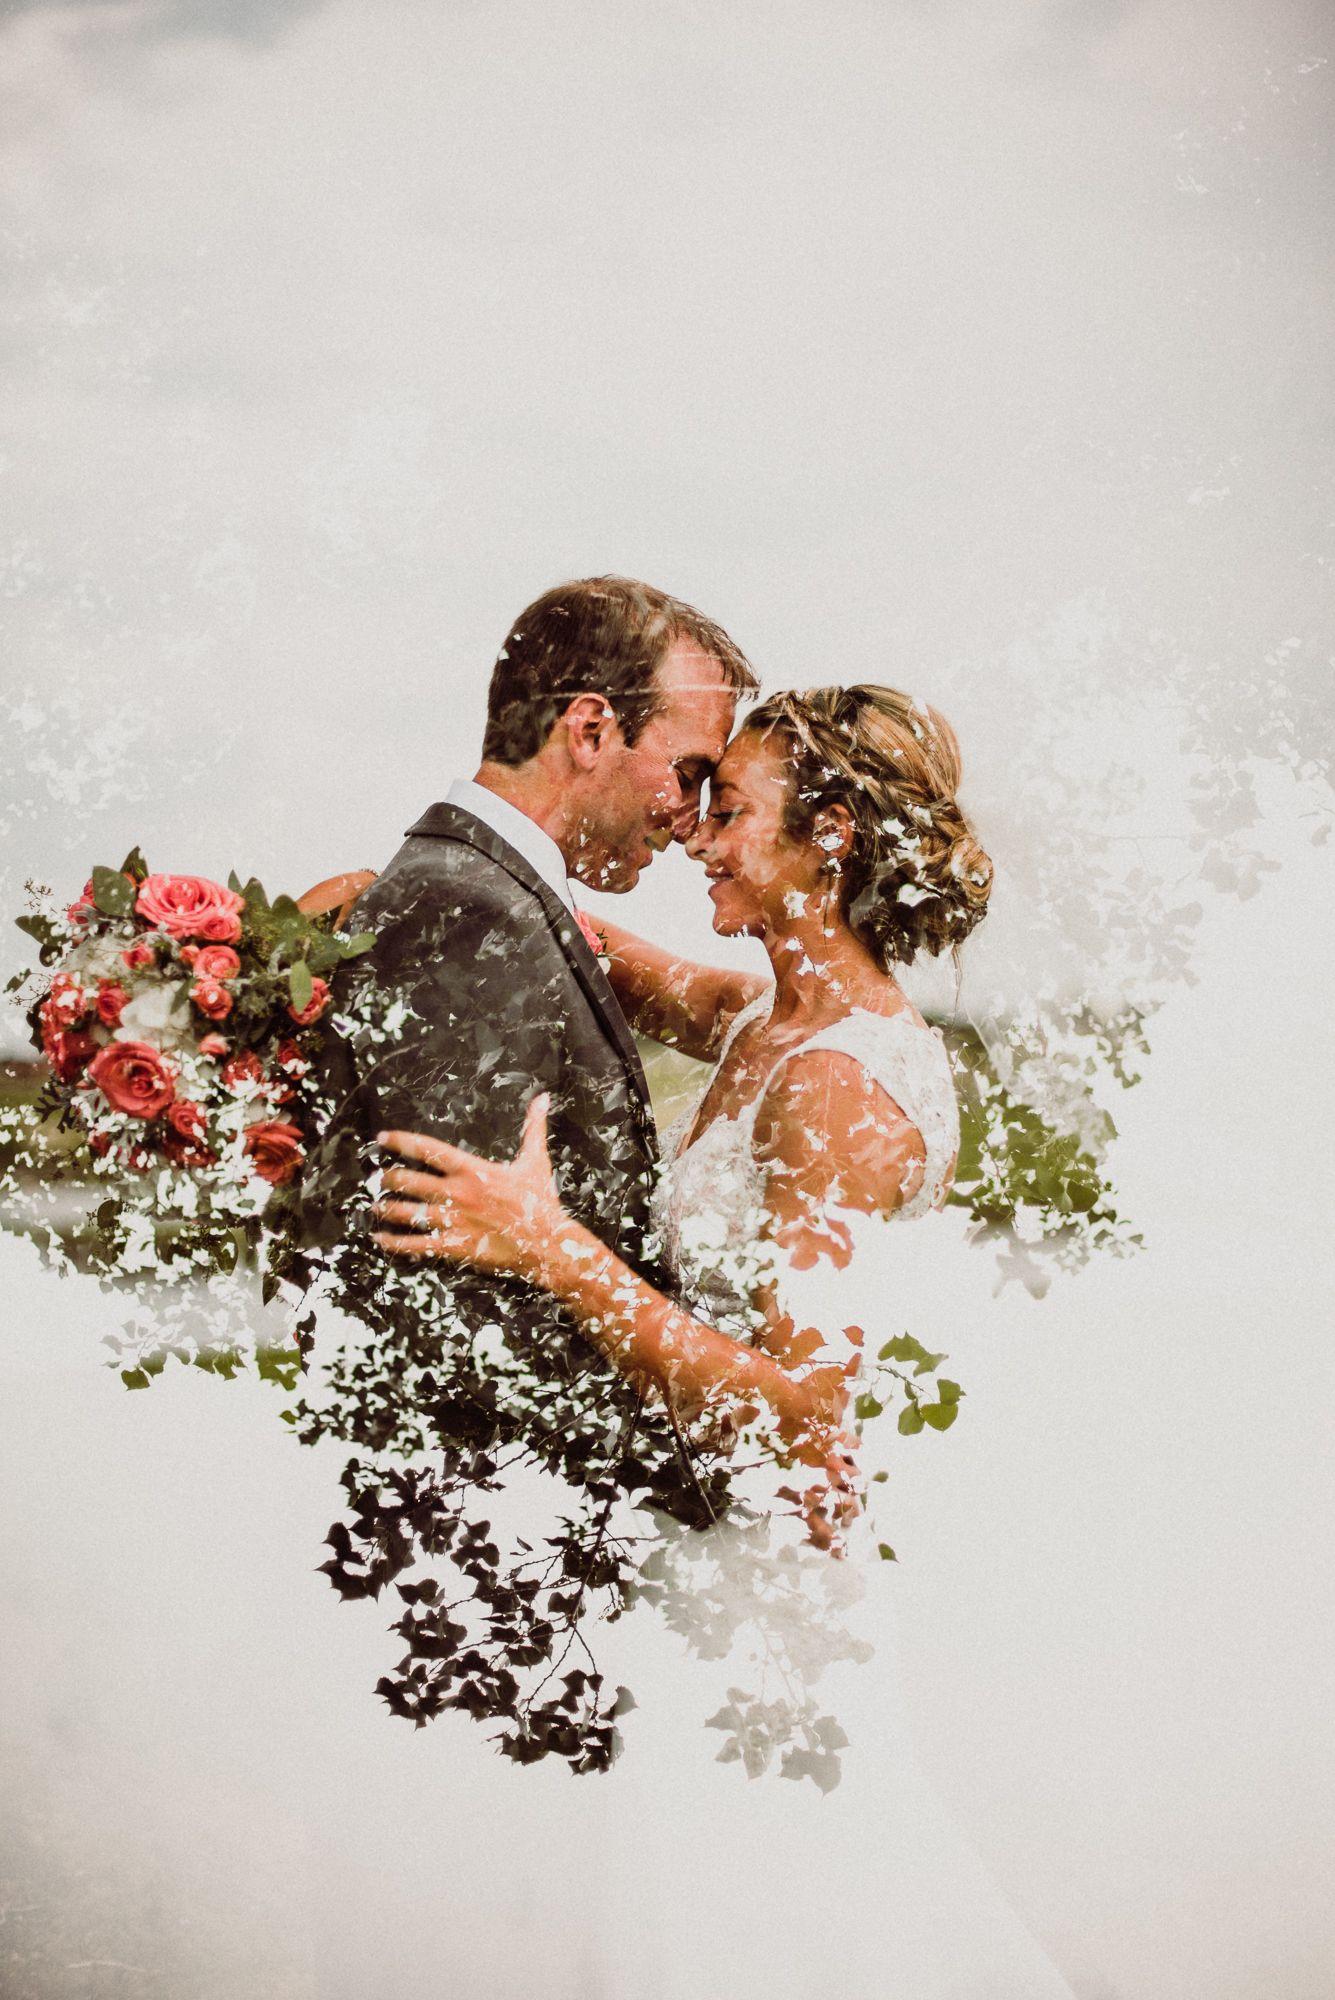 Nicole & JT Wedding doubleexposure multipleexposure